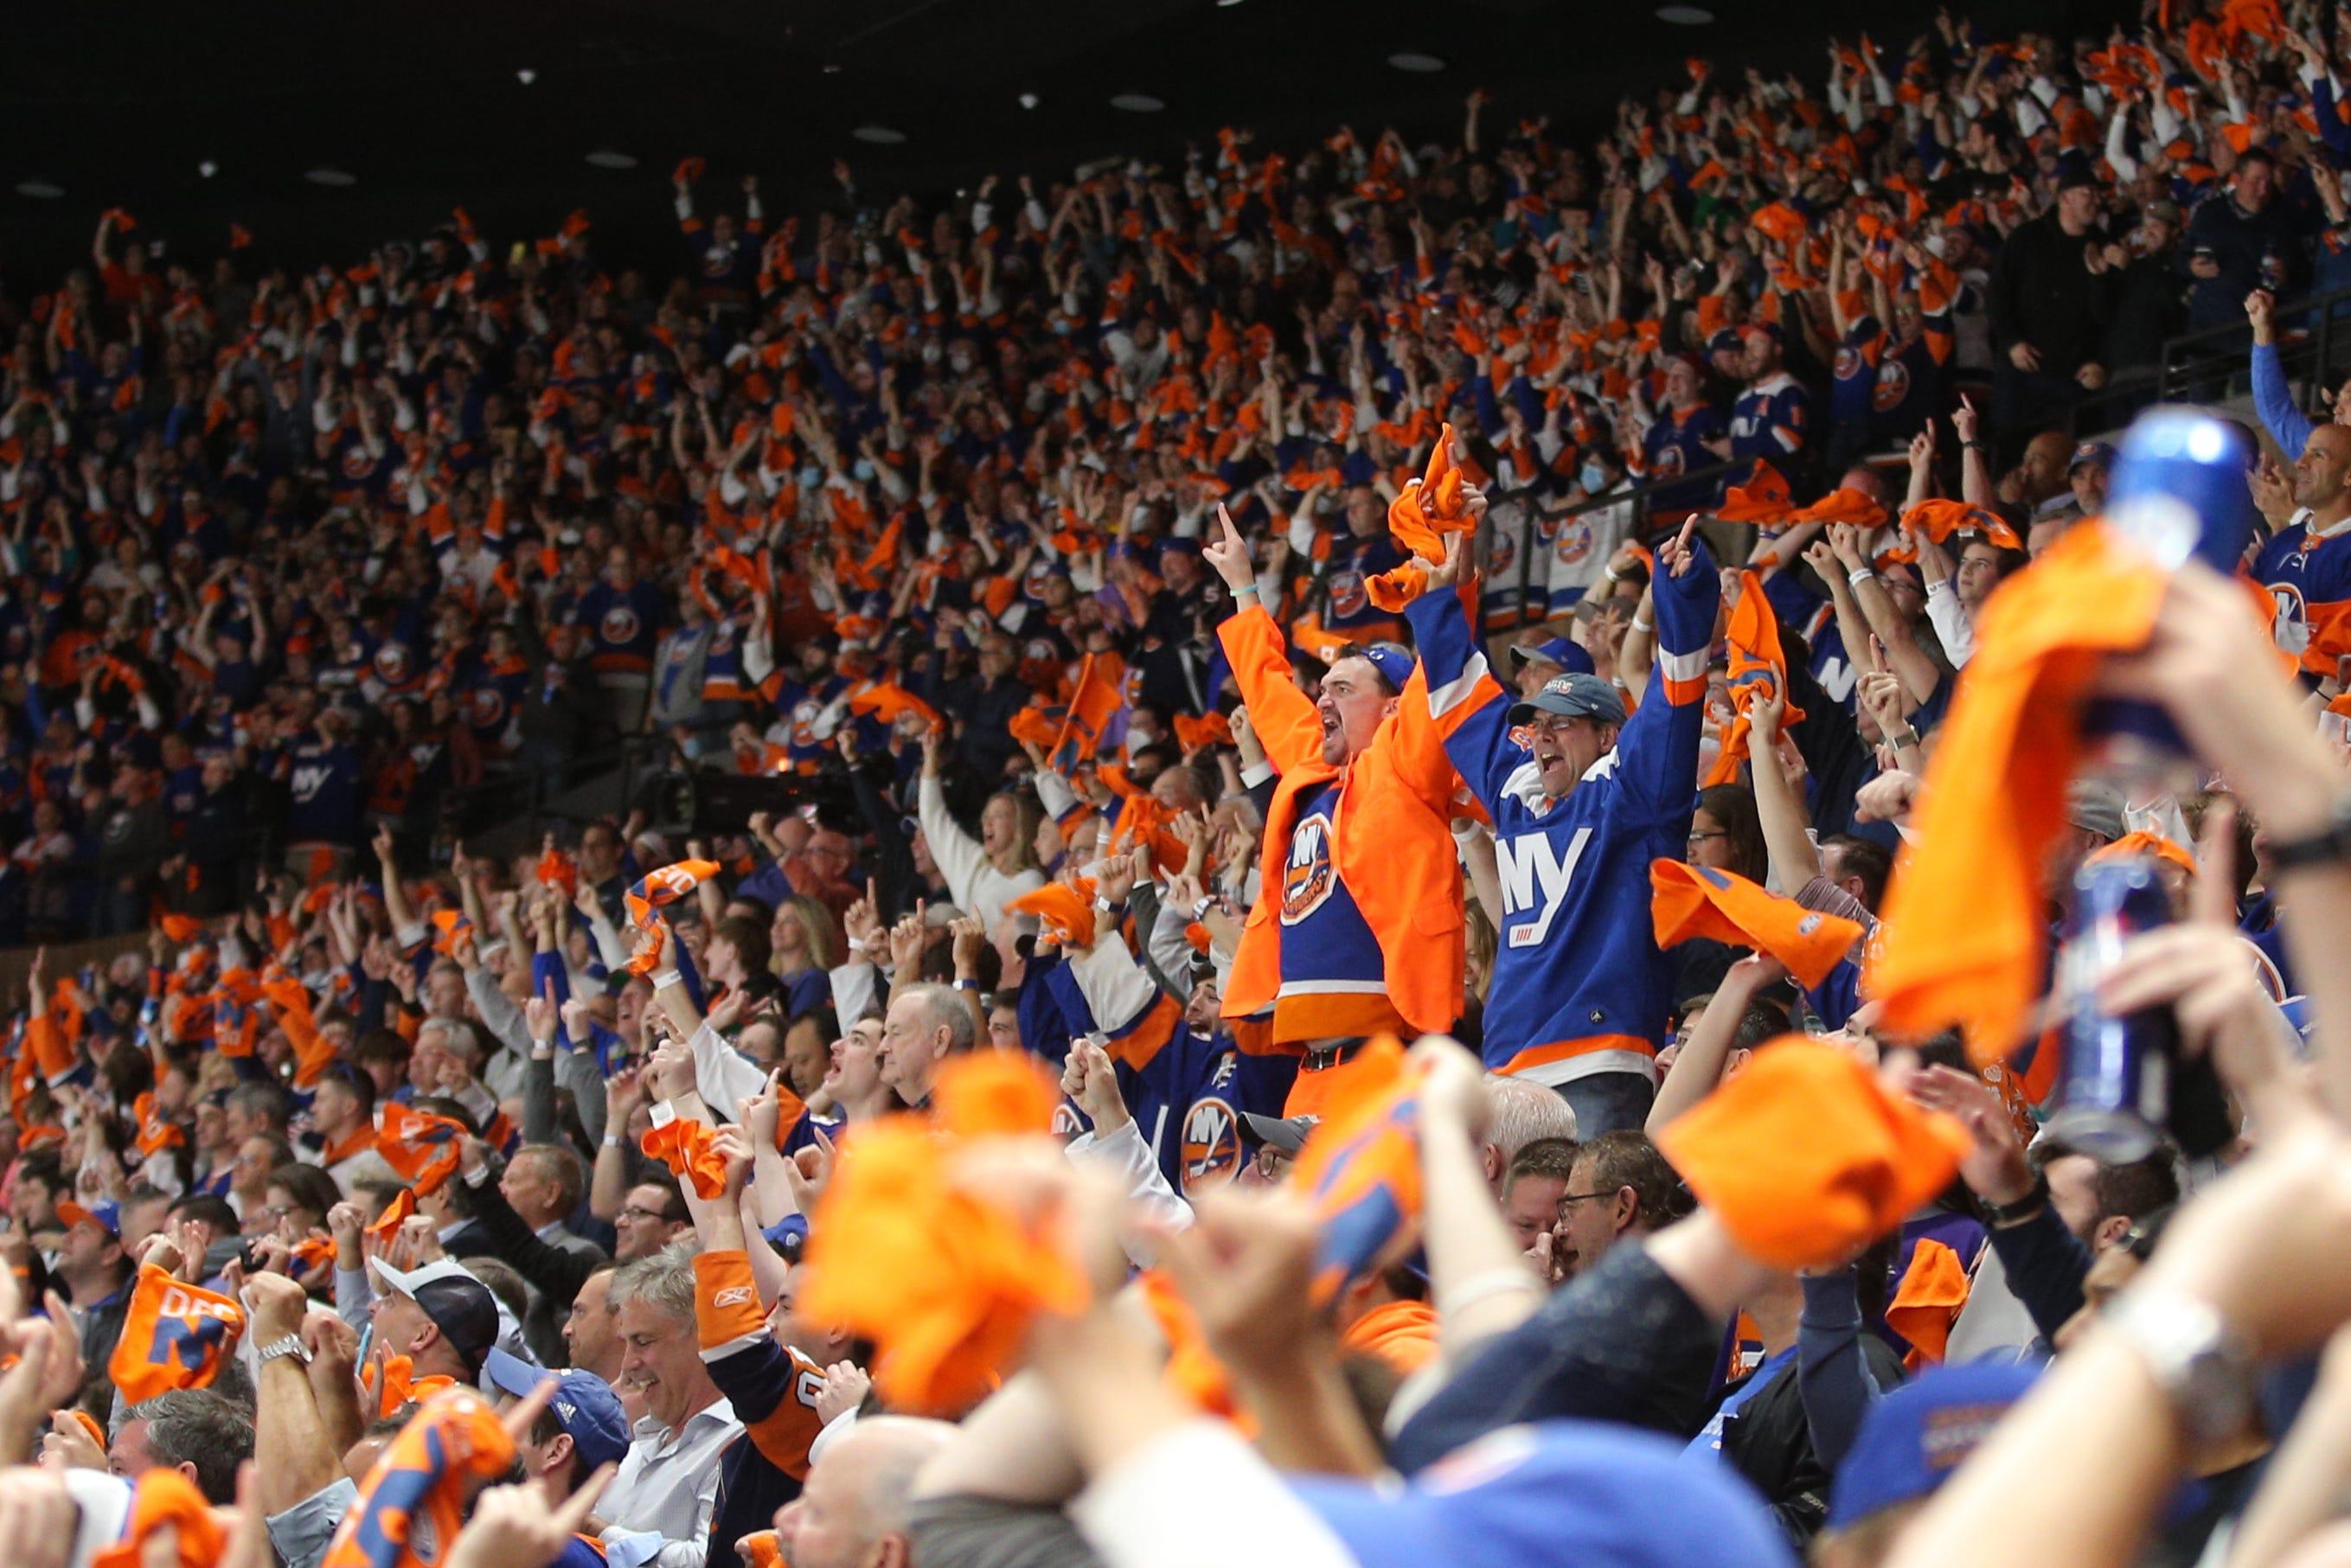 Islanders – and fans – giving Nassau Coliseum proper sendoff with final postseason run